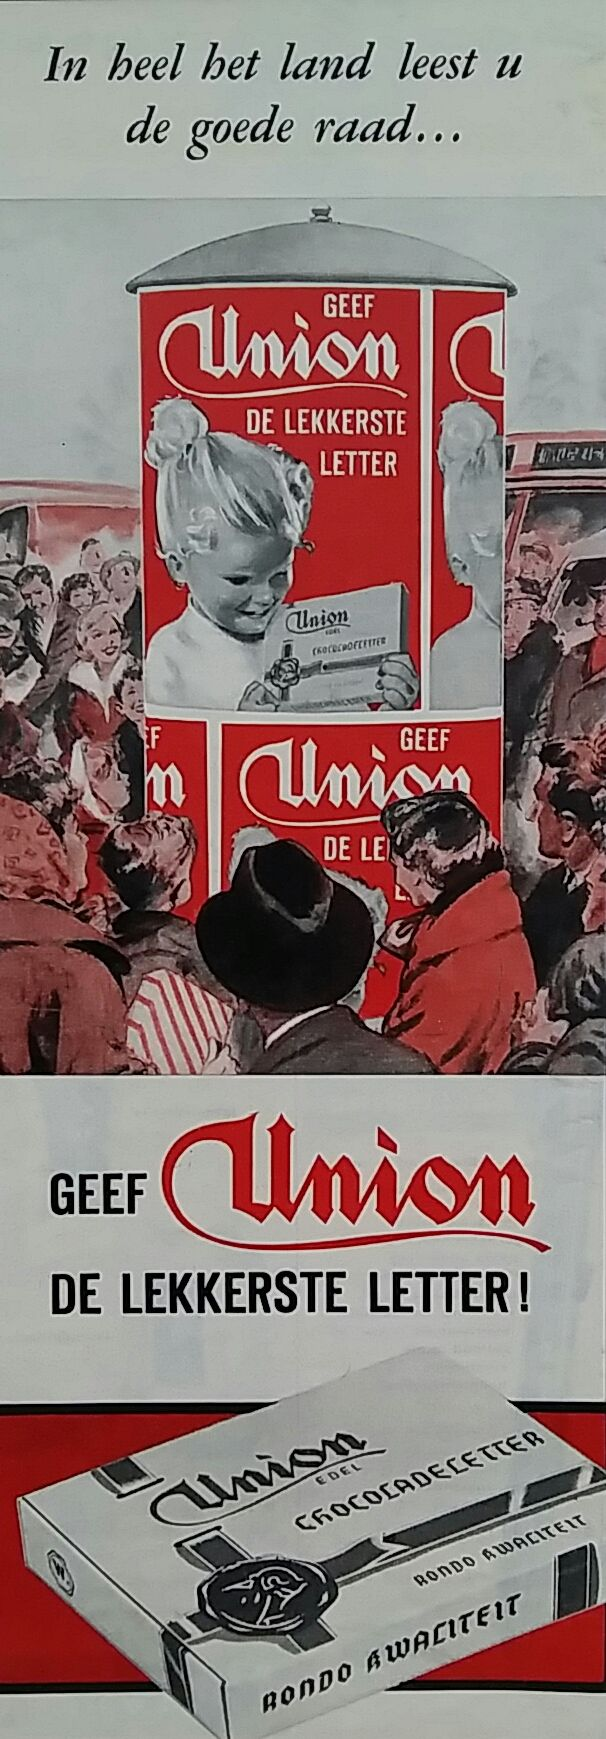 UNION advertentie 1959